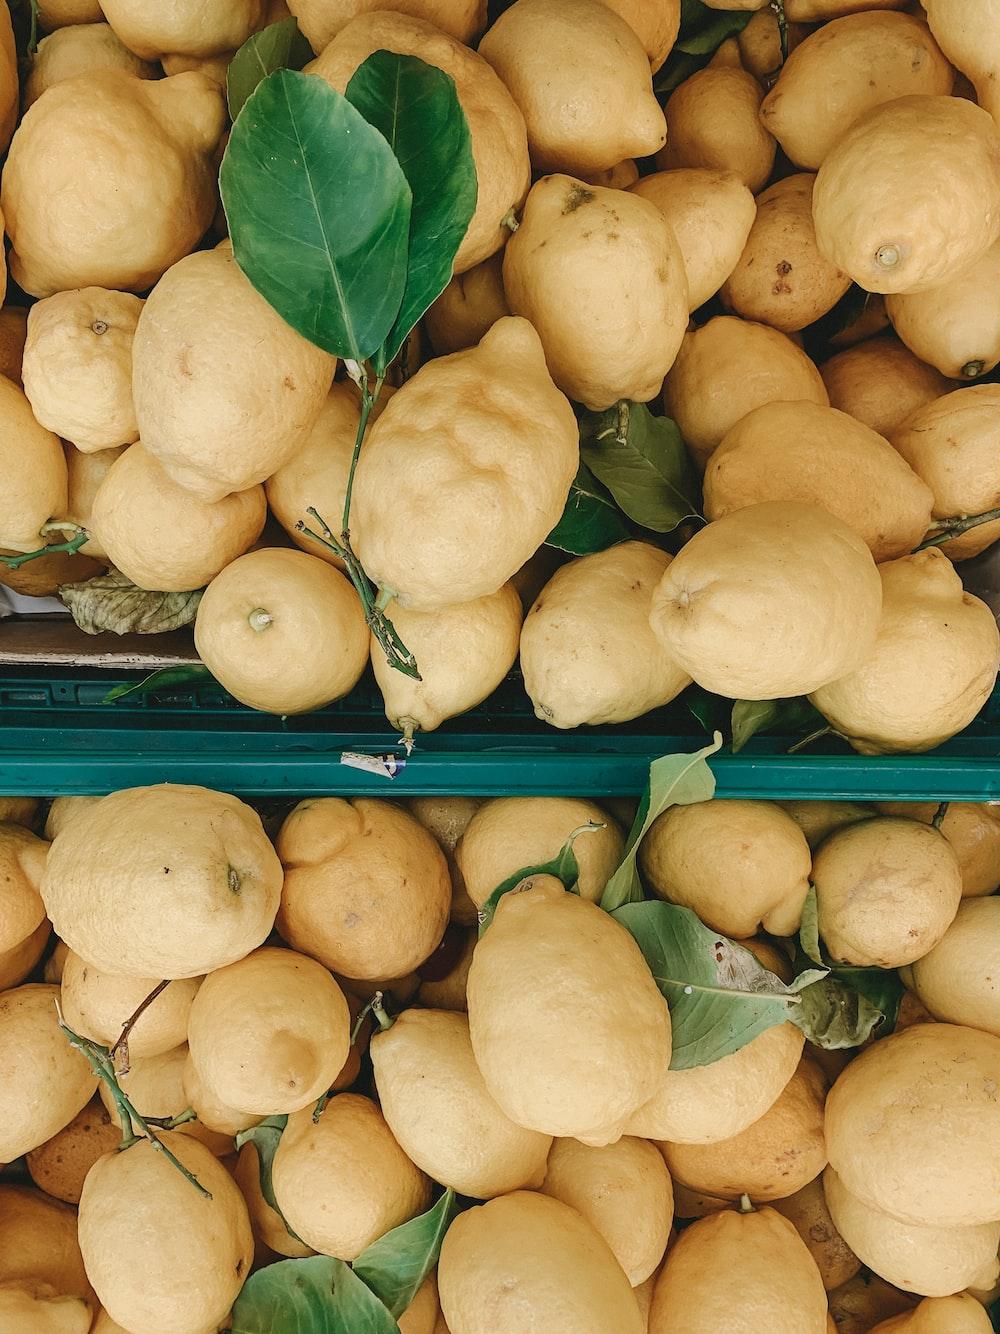 close-up photo of yellow fruits